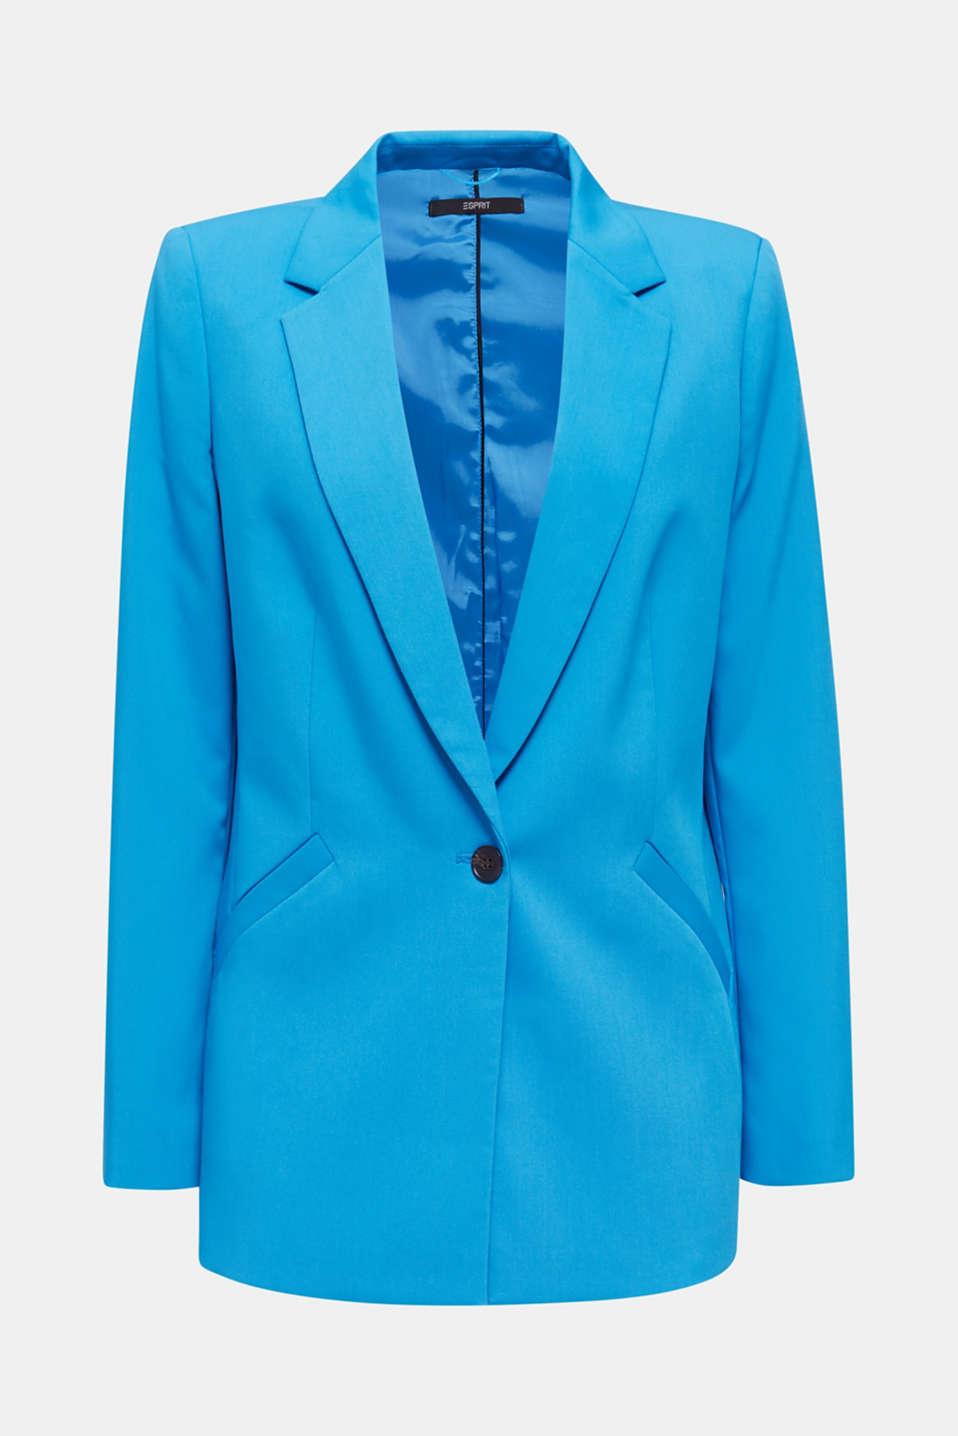 SHIMMER mix + match stretch blazer, DARK TURQUOISE, detail image number 5